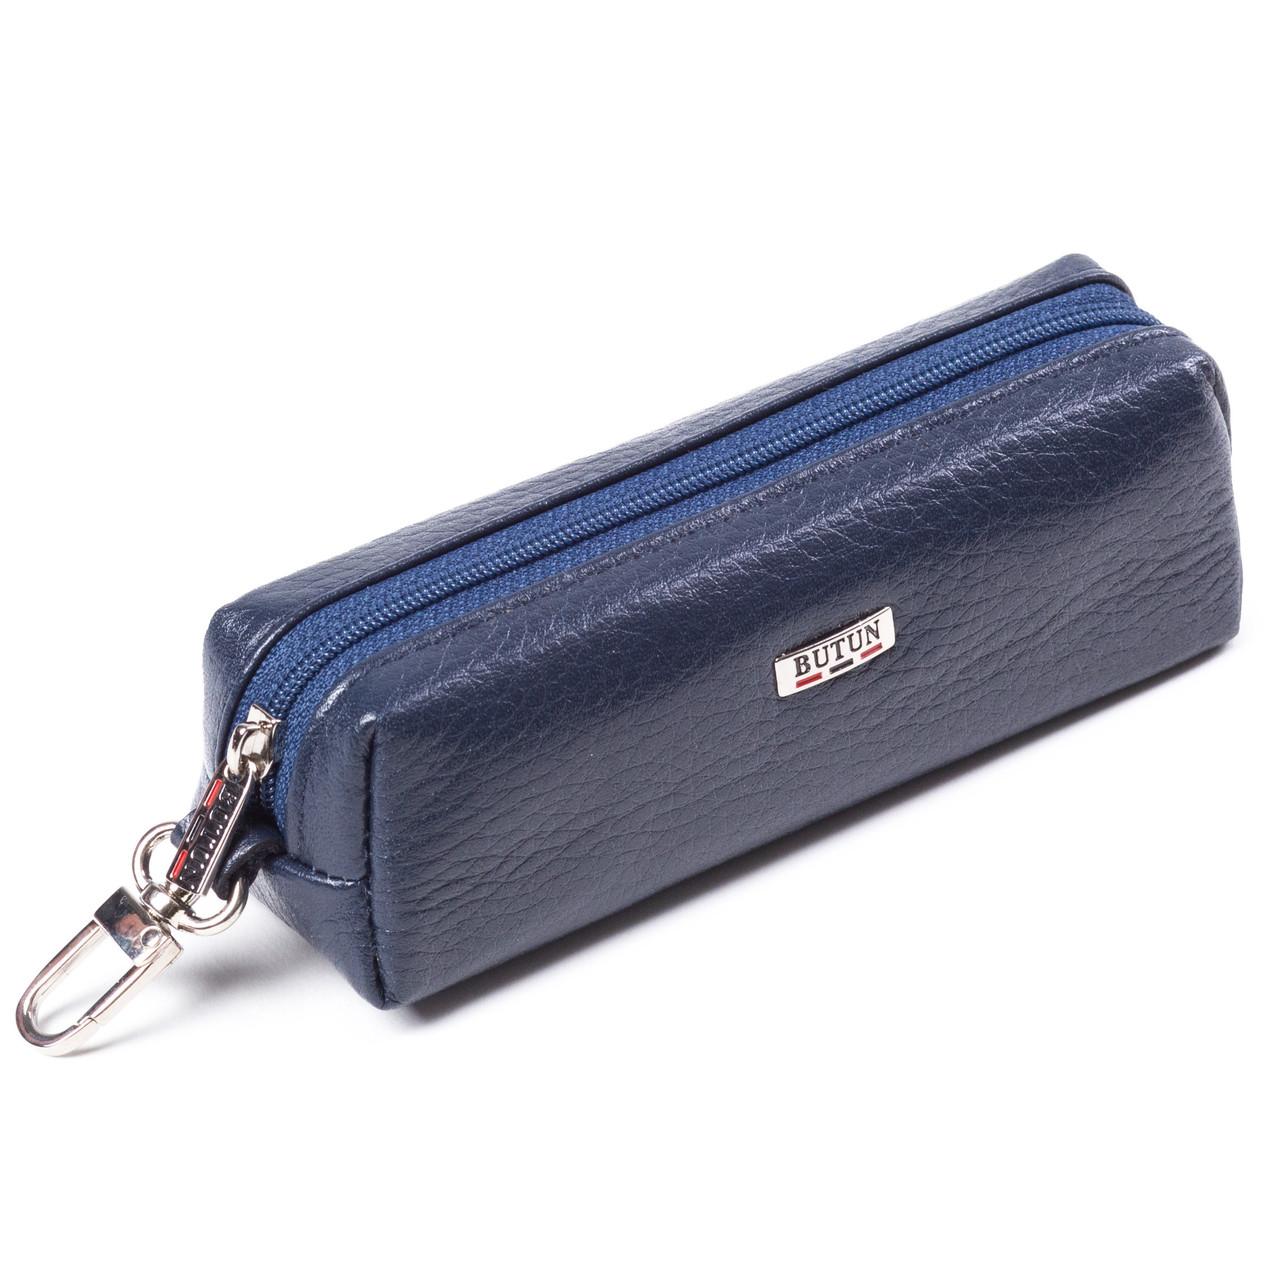 Ключница кожаная синяя Butun 784-004-034